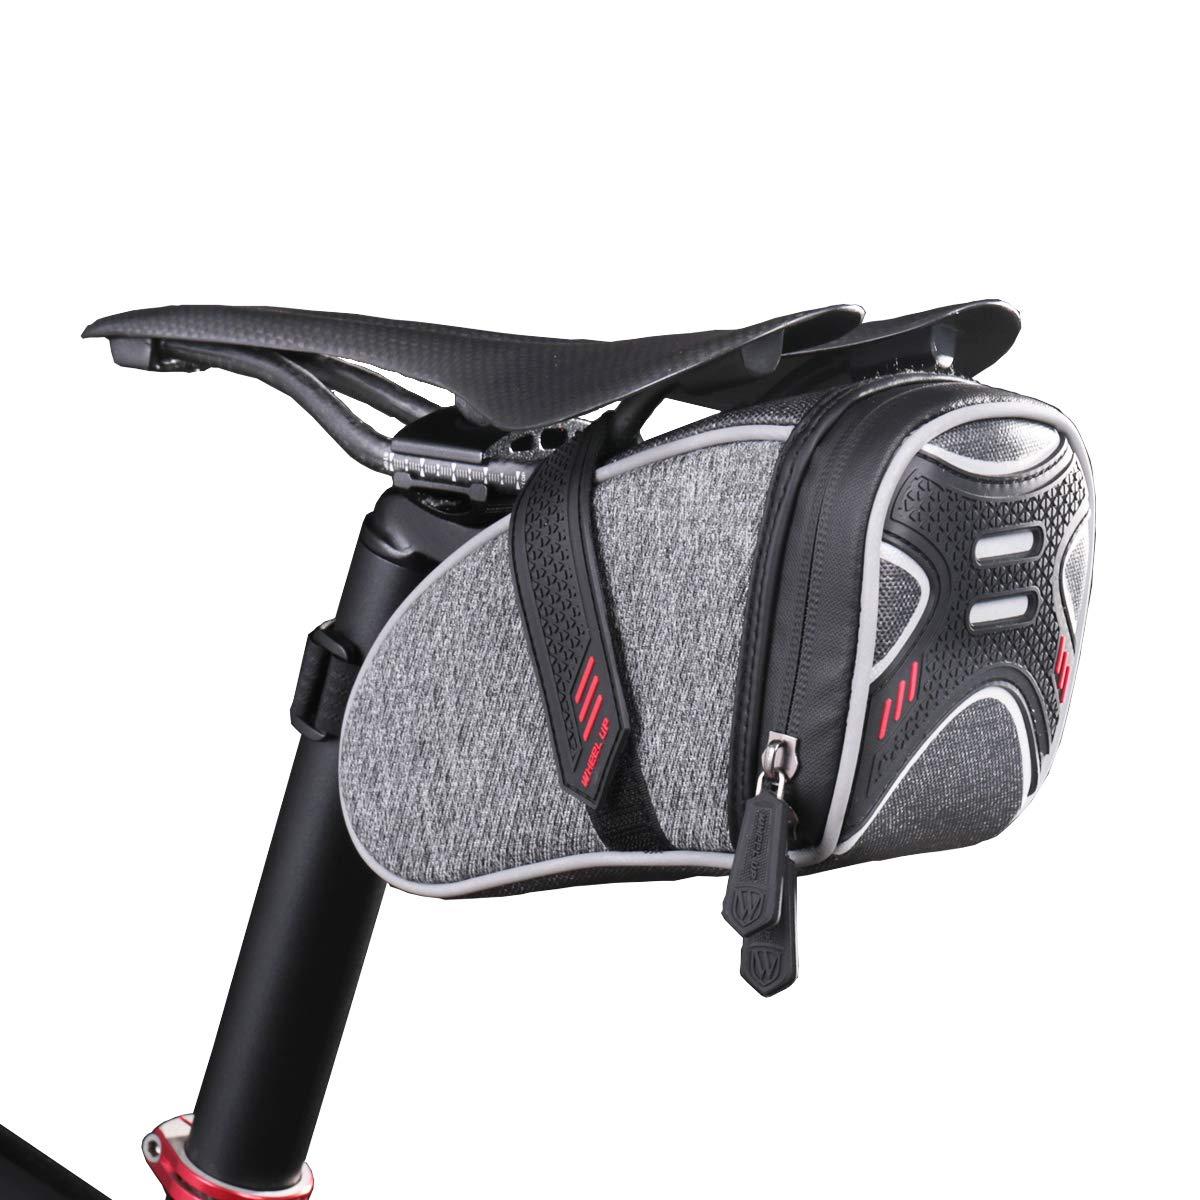 WHEEL UP Strap-On Bike Bag Under Seat Pack Waterproof Wedge Saddle Bag/Seat Bag for Cycling (Grey Nylon)